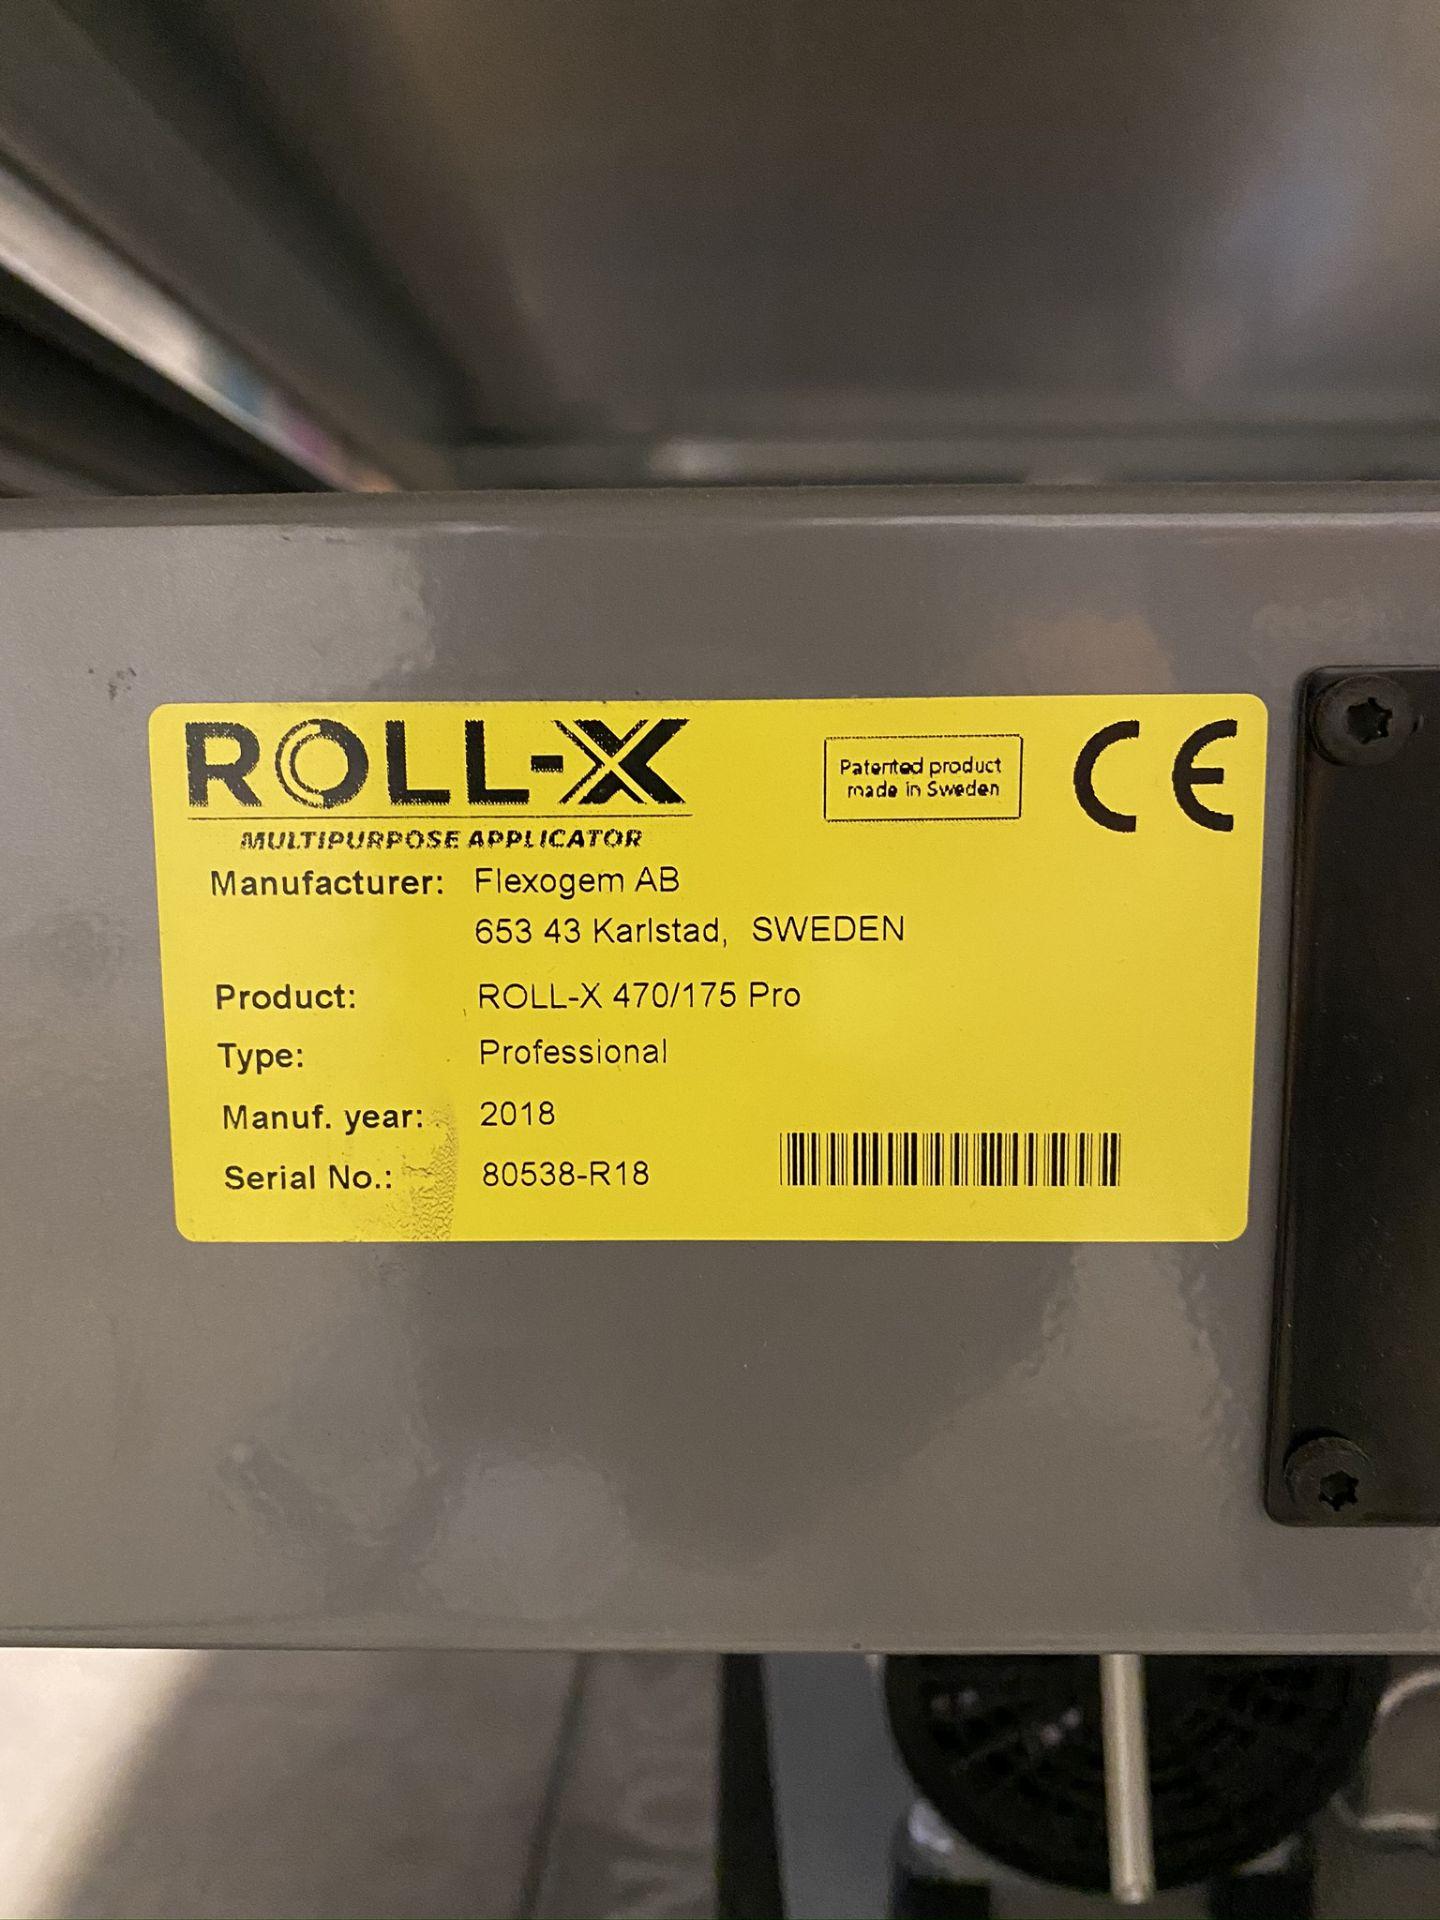 Lot 0A - 2018 ROLL -X MULTIPURPOSE FLATBED APPLICATOR, MODEL ROLL-X-470/175 PRO, S/N 80538-R18